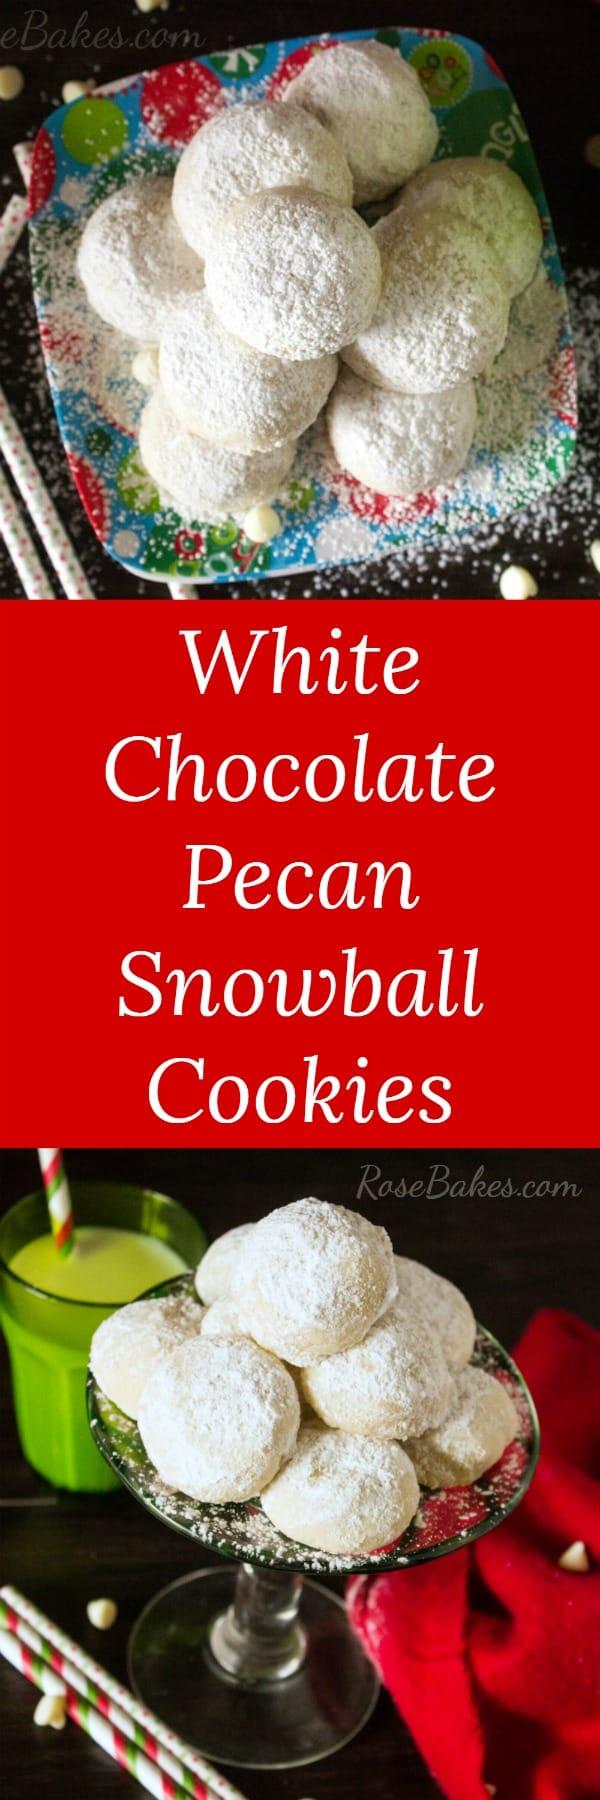 White Chocolate Pecan Snowball Cookies by RoseBakes